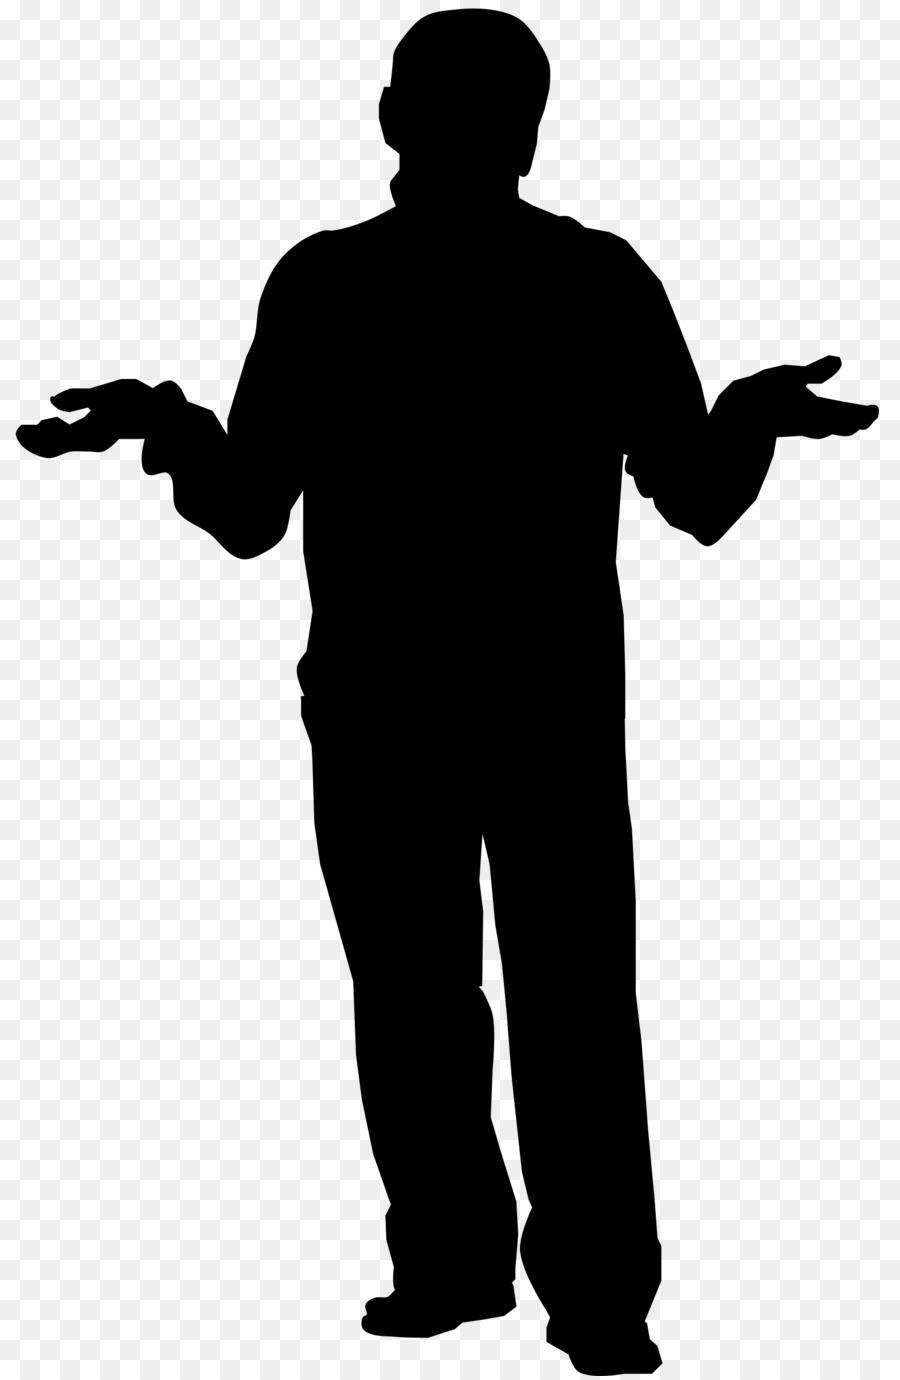 Shrugging shoulders clipart image free stock Man Cartoon clipart - Emoticon, Man, Hand, transparent clip art image free stock